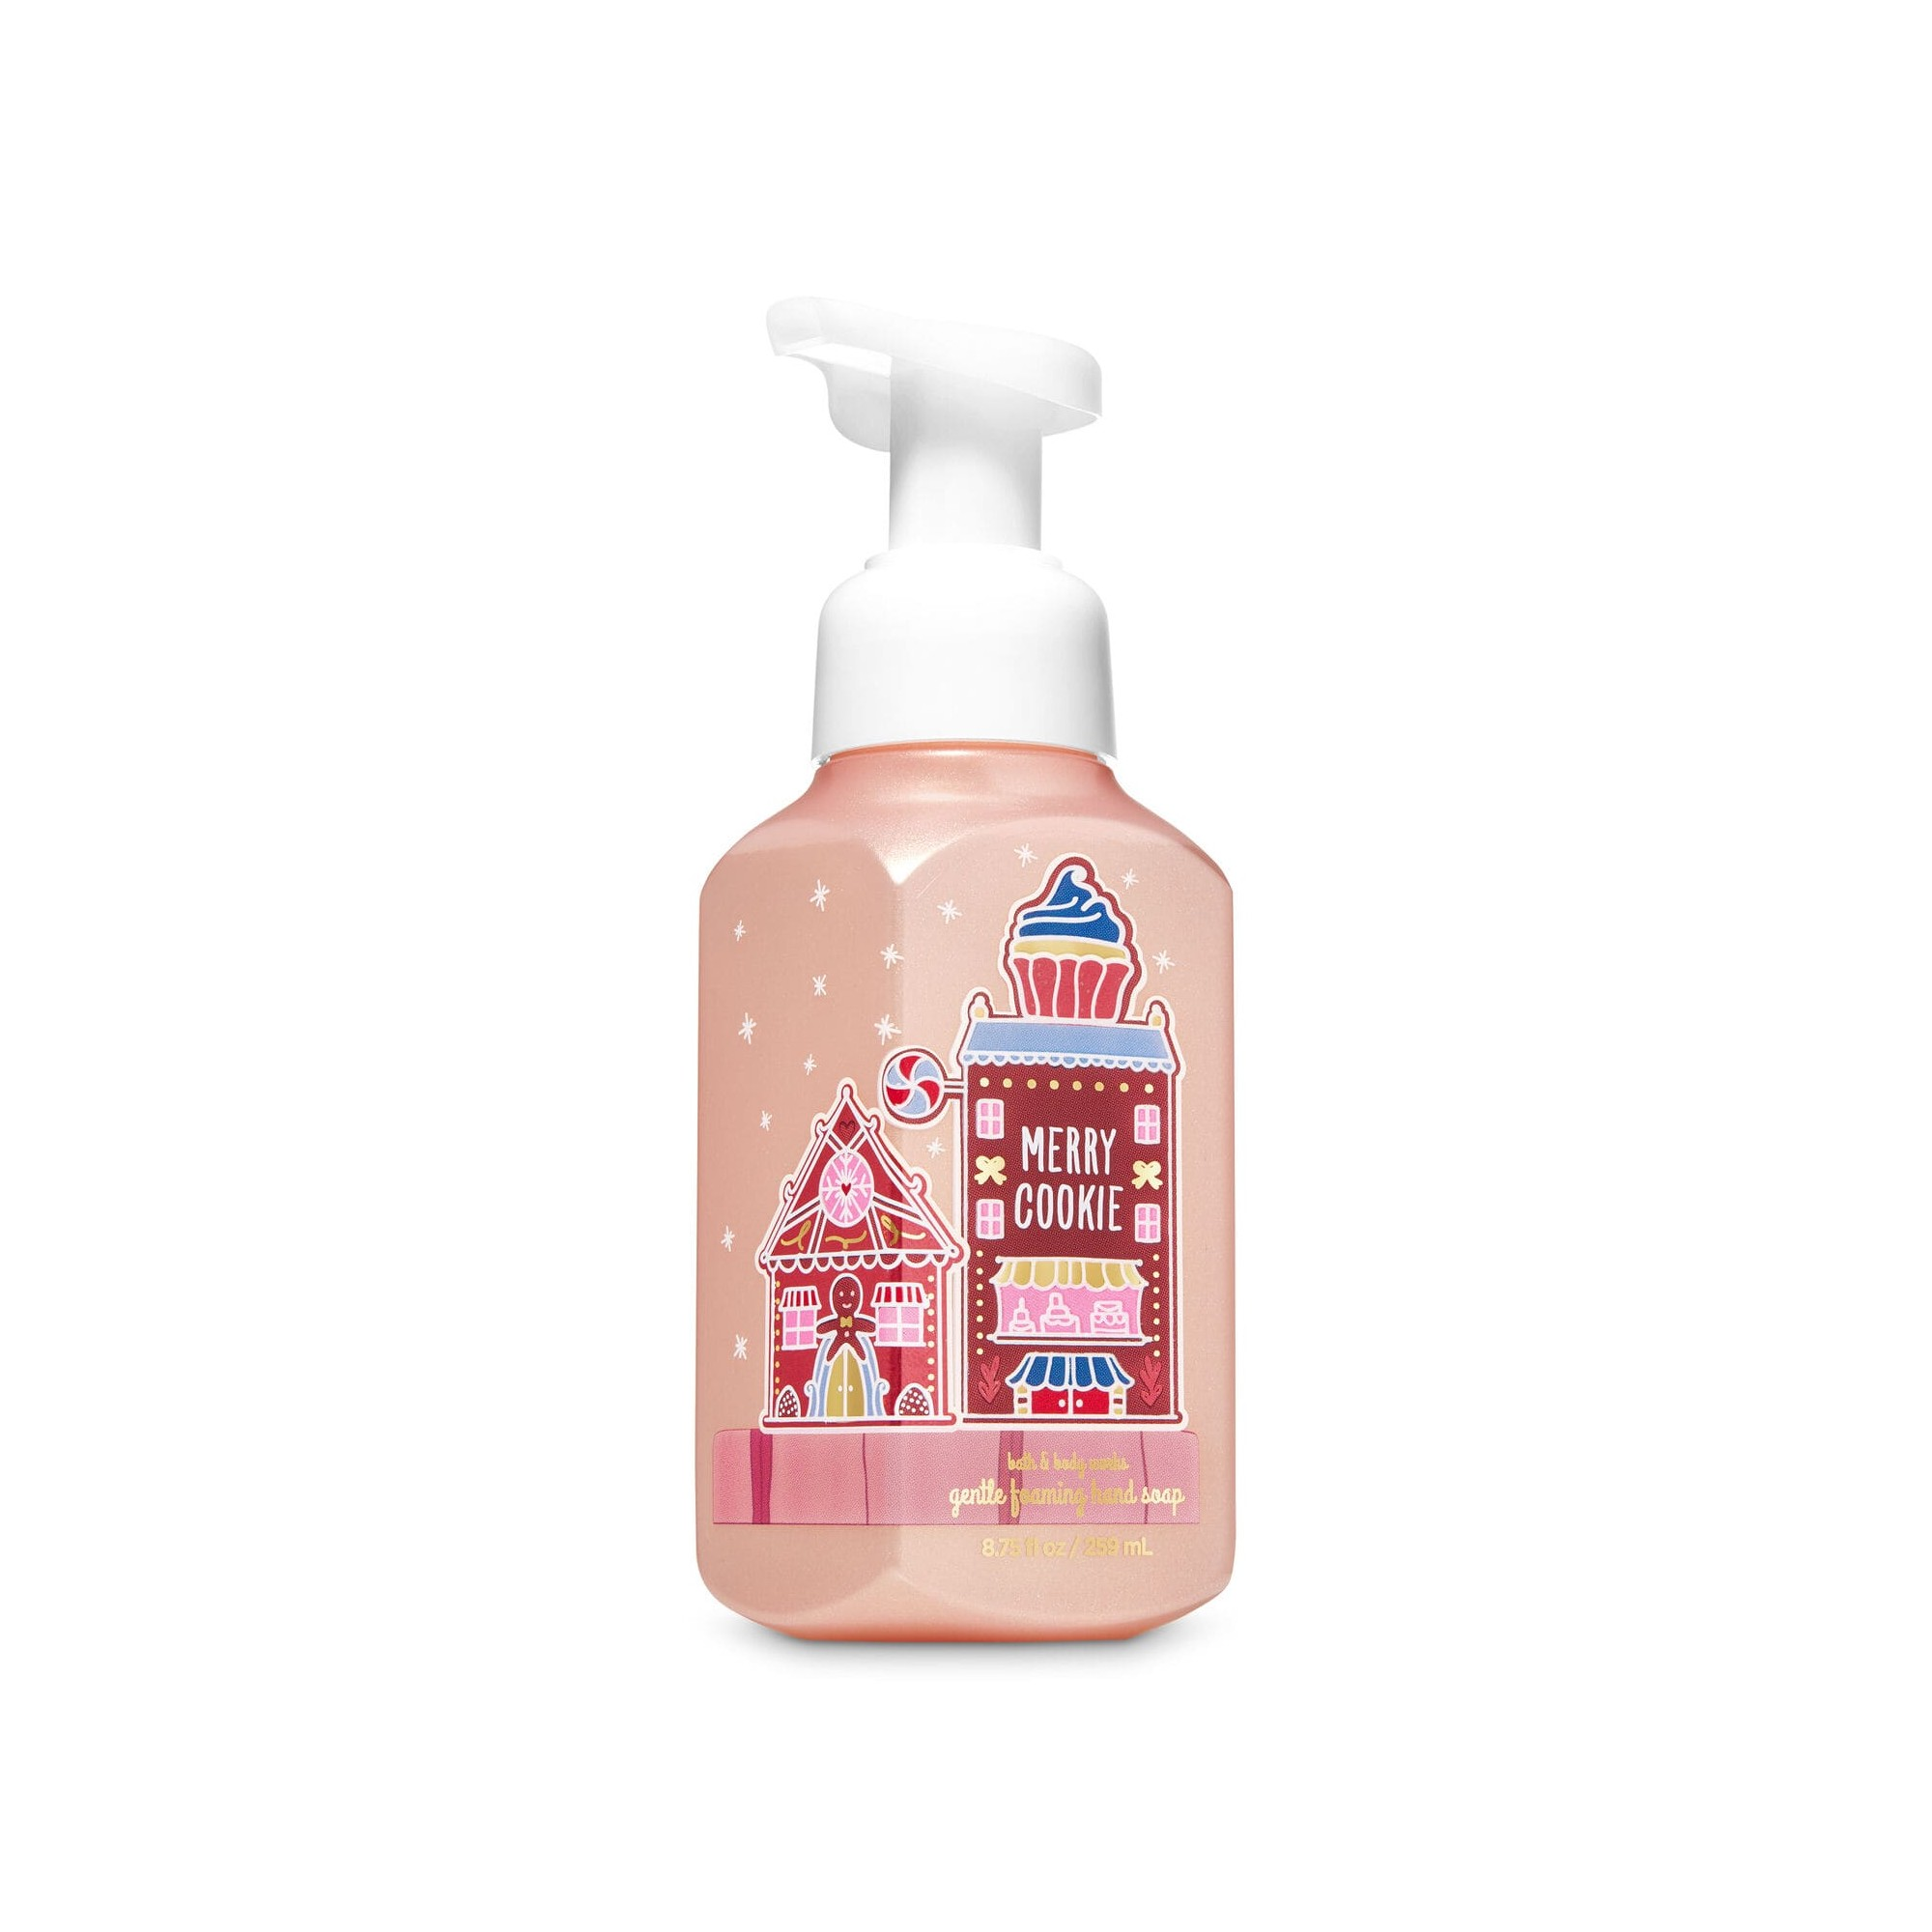 Bath & Body Works Merry Cookie Gentle Foaming Hand Soap